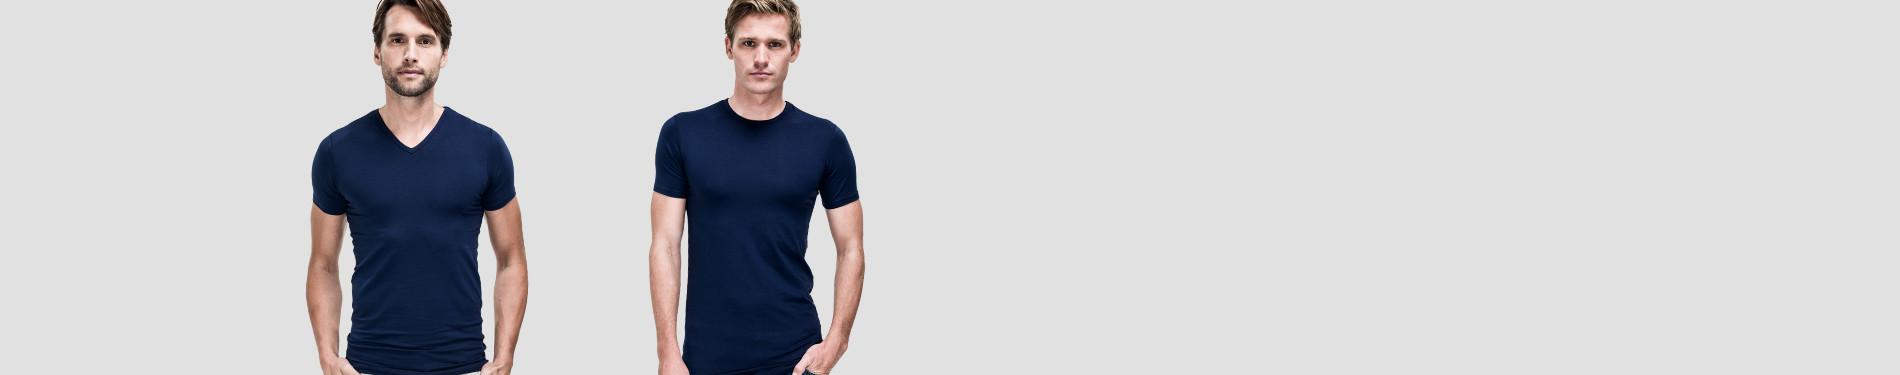 Blaue T-Shirts